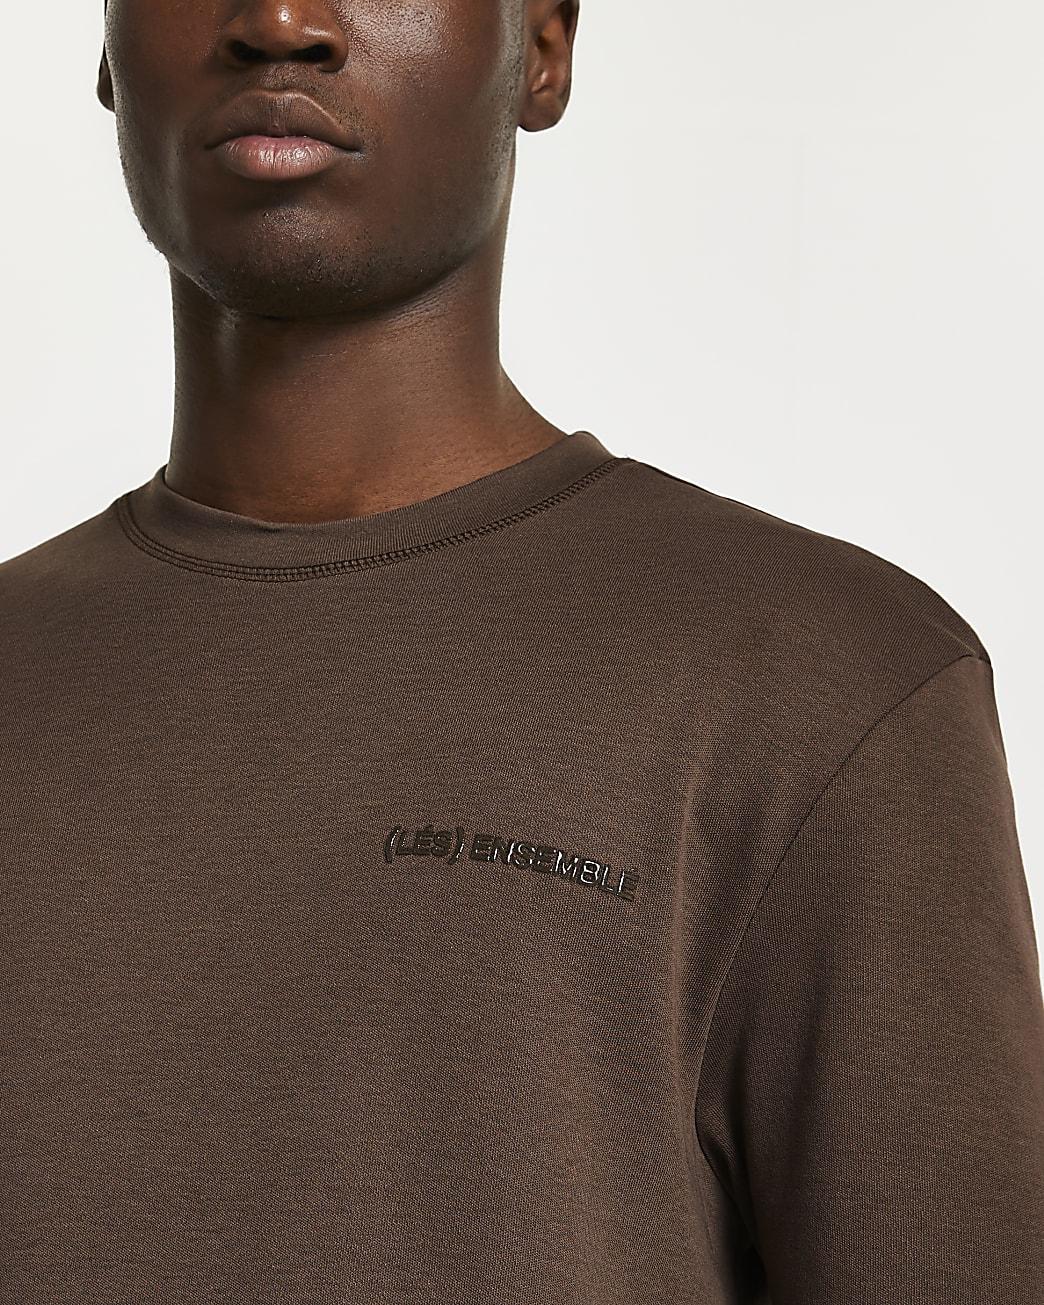 Brown 'Les Ensembles' t-shirt